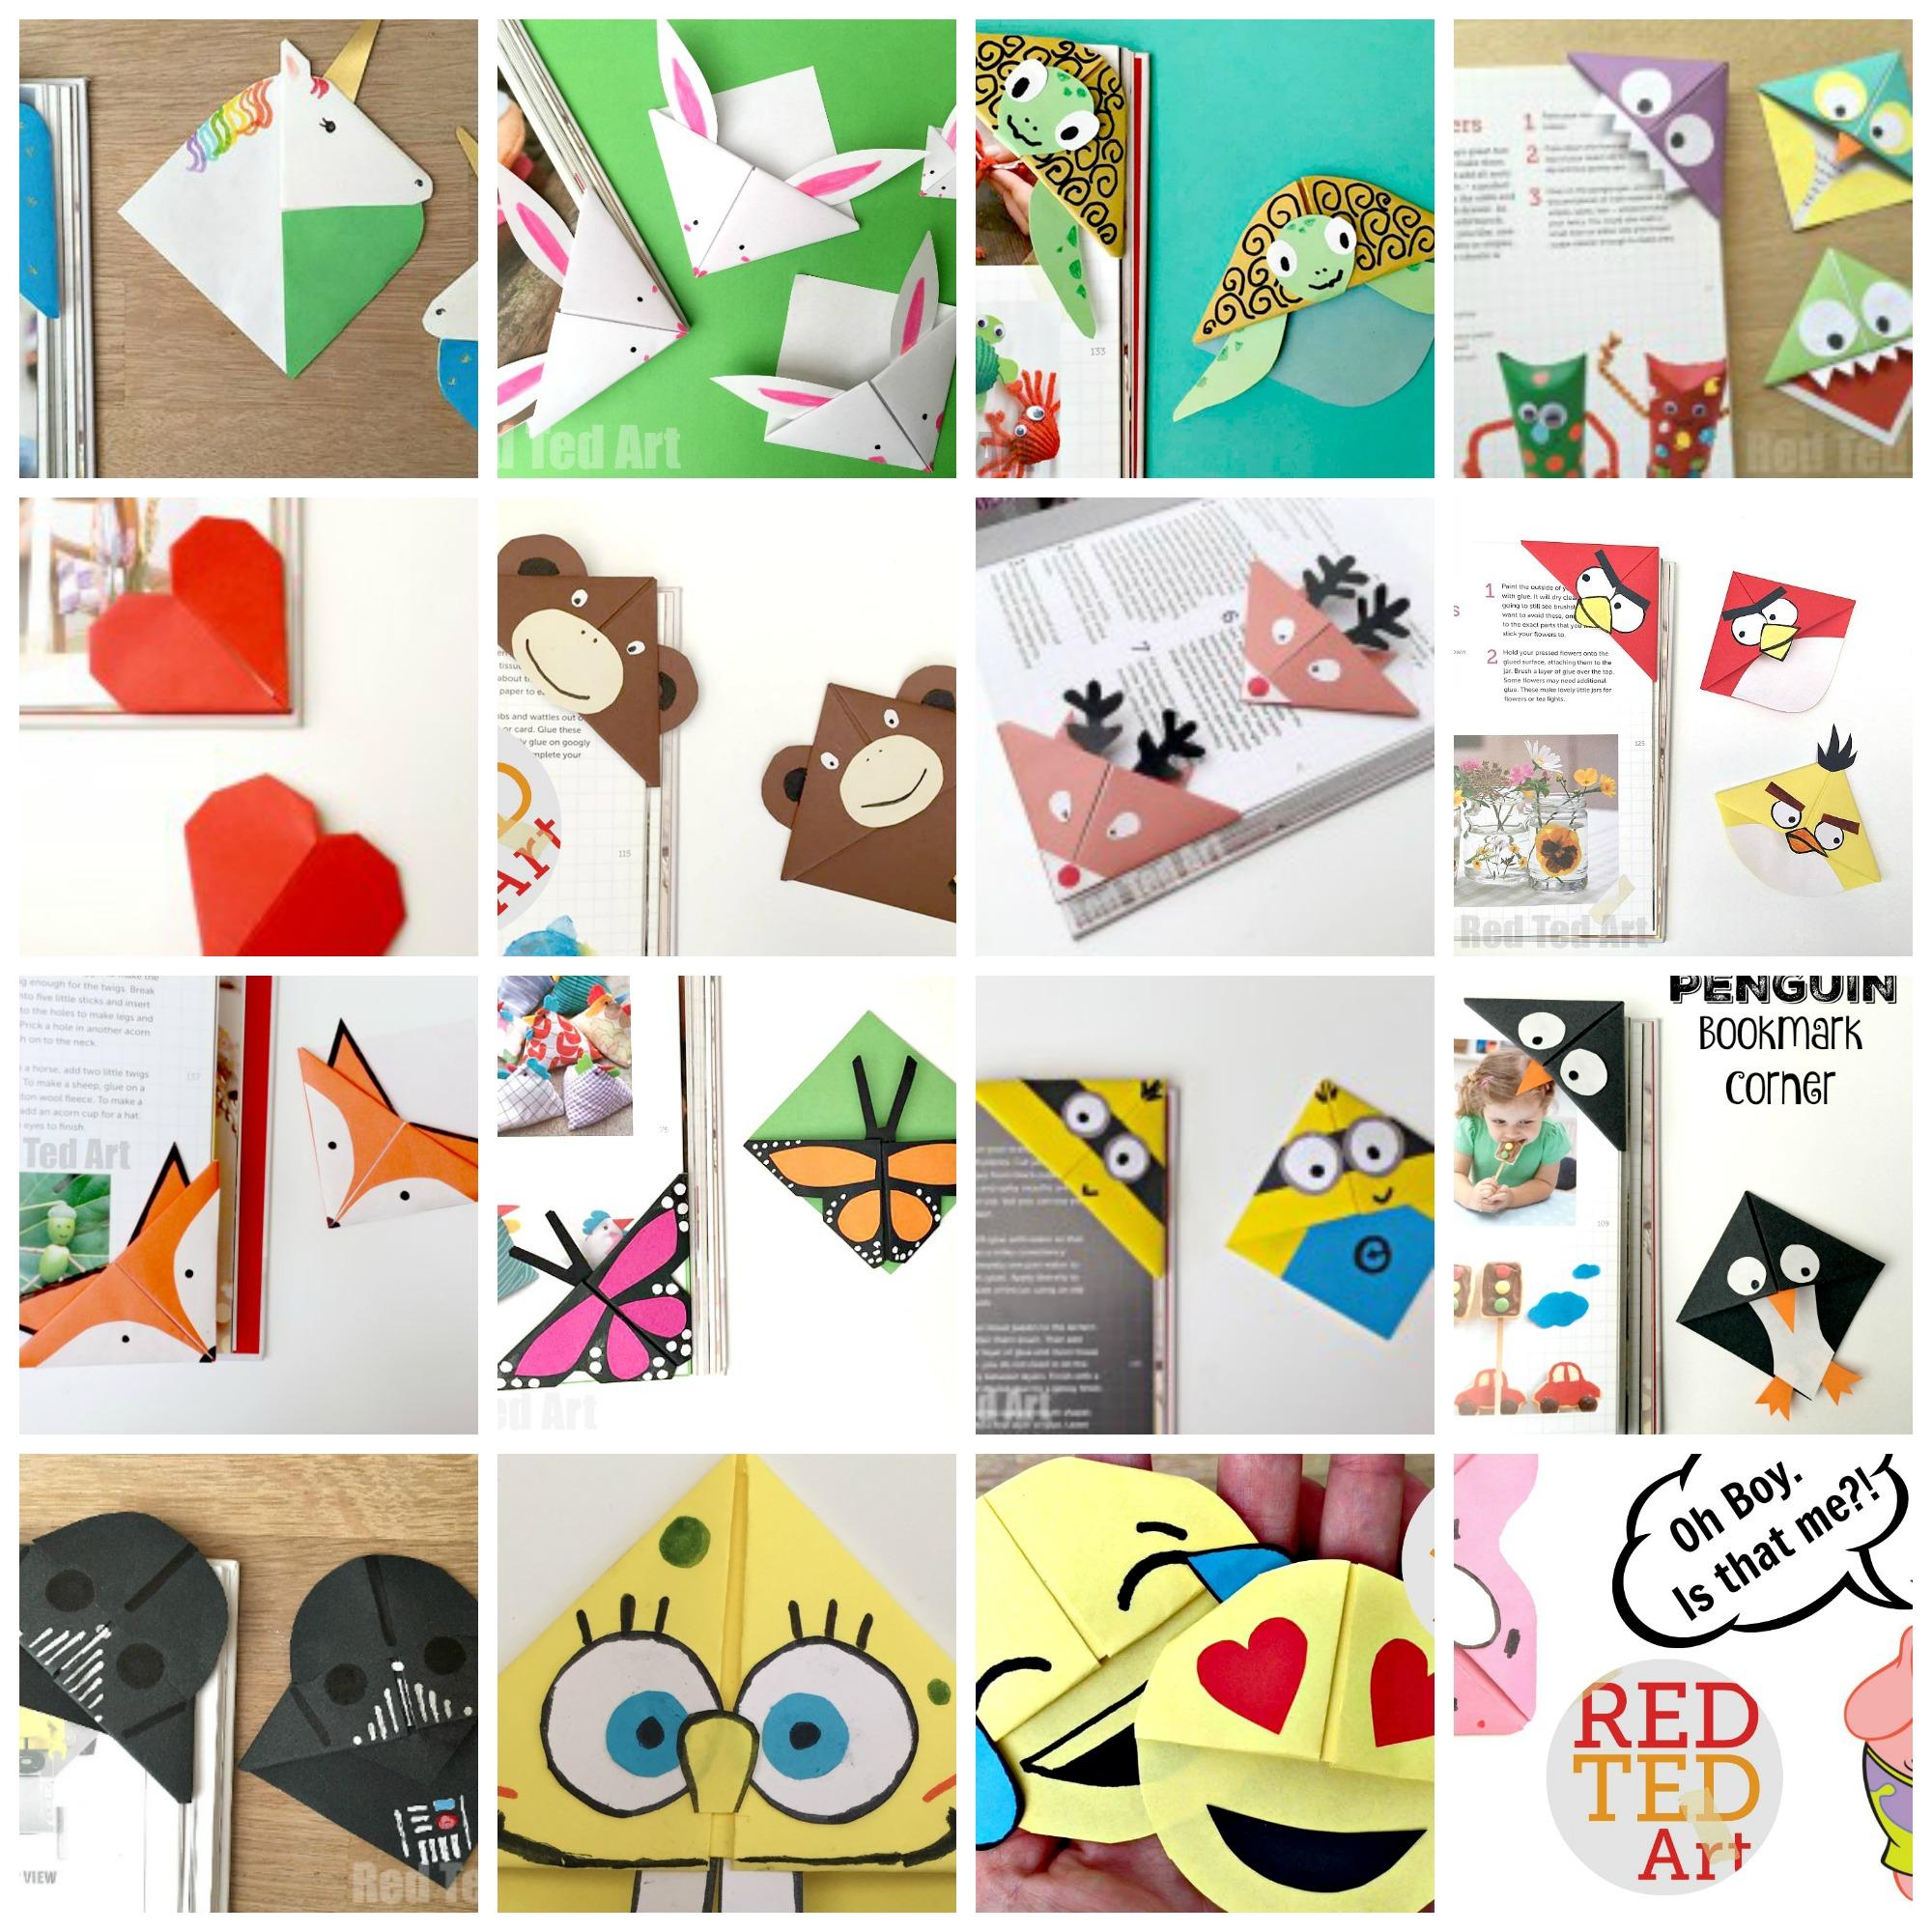 Some-of-the-best-Corner-Bookmark-designs-ever.-LOVE-LOVE-LOVE